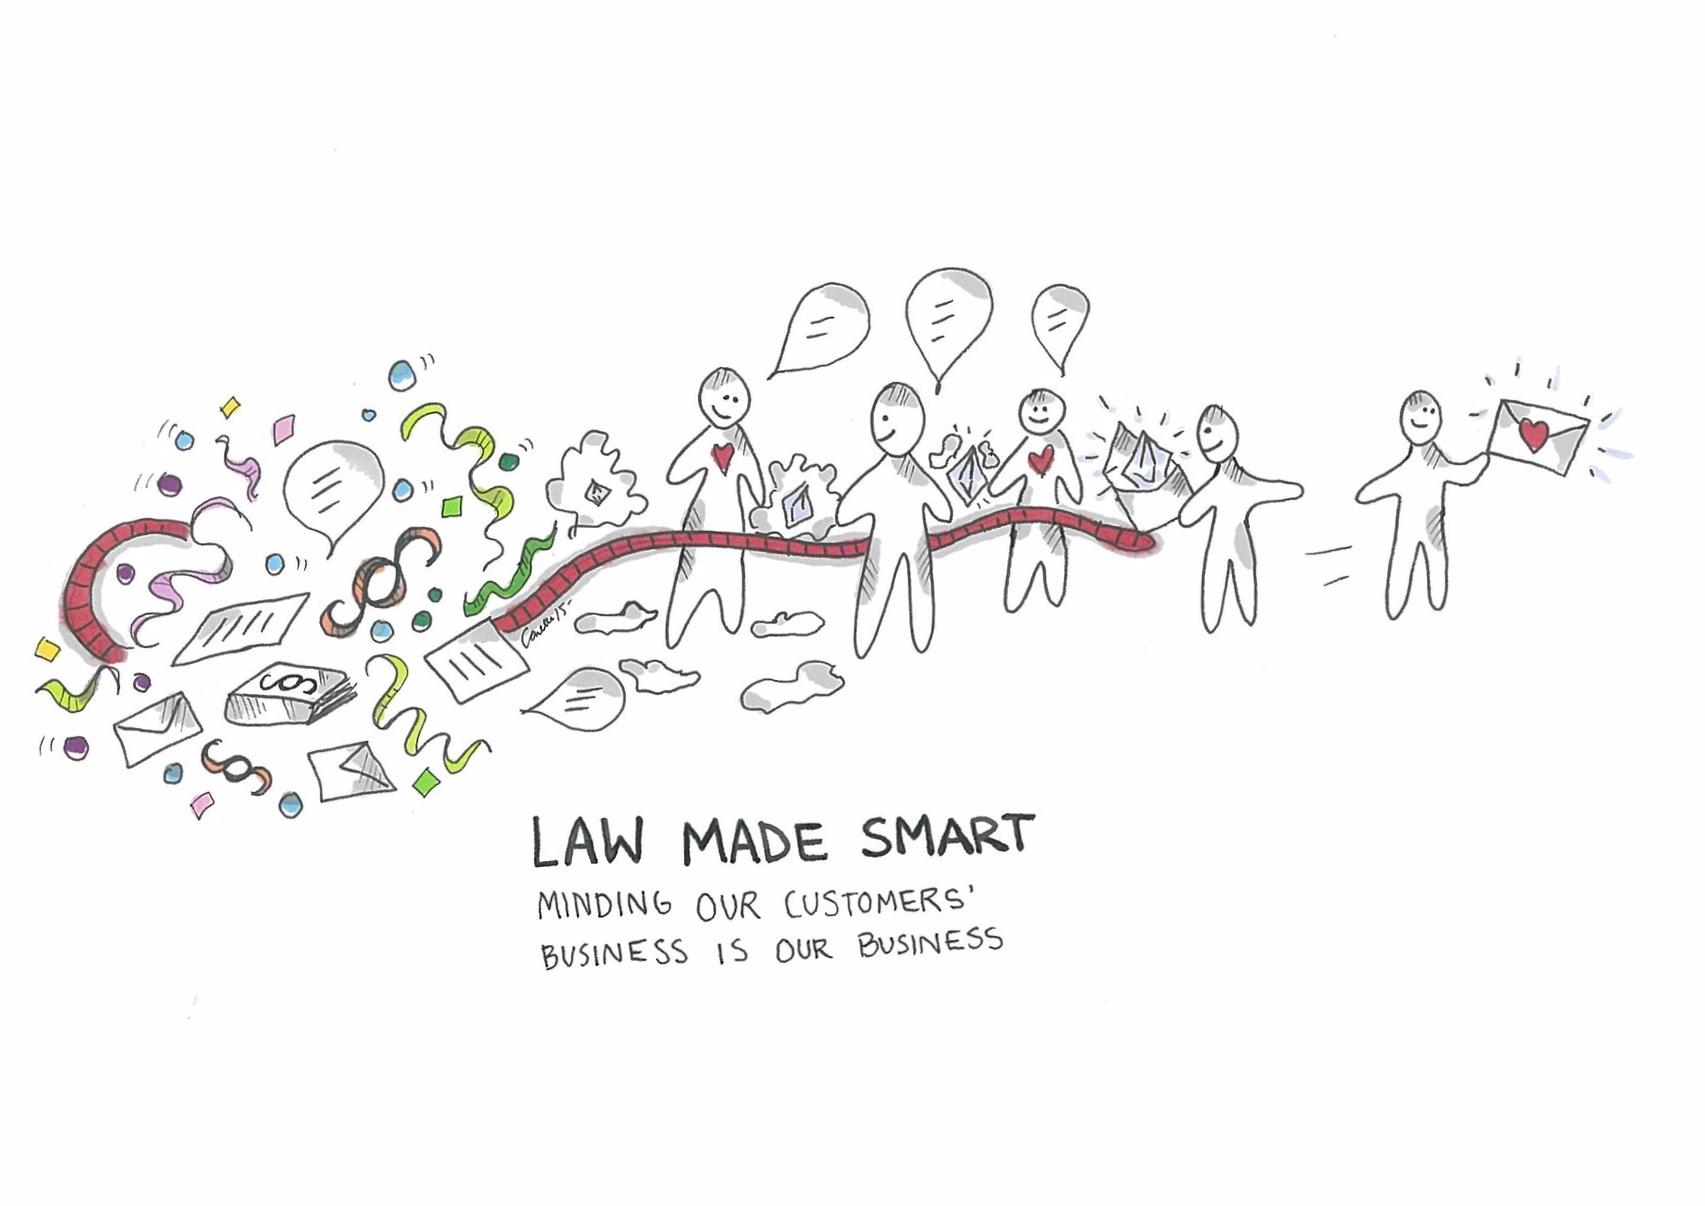 Law+made+smart_300.jpg